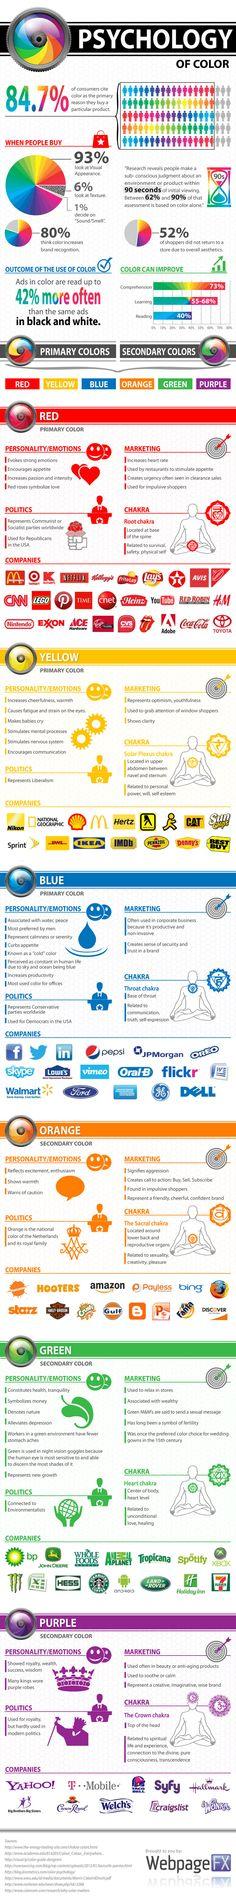 Logo Color Psychology Considerations | StockLogos.com (infographic) #logo #branding